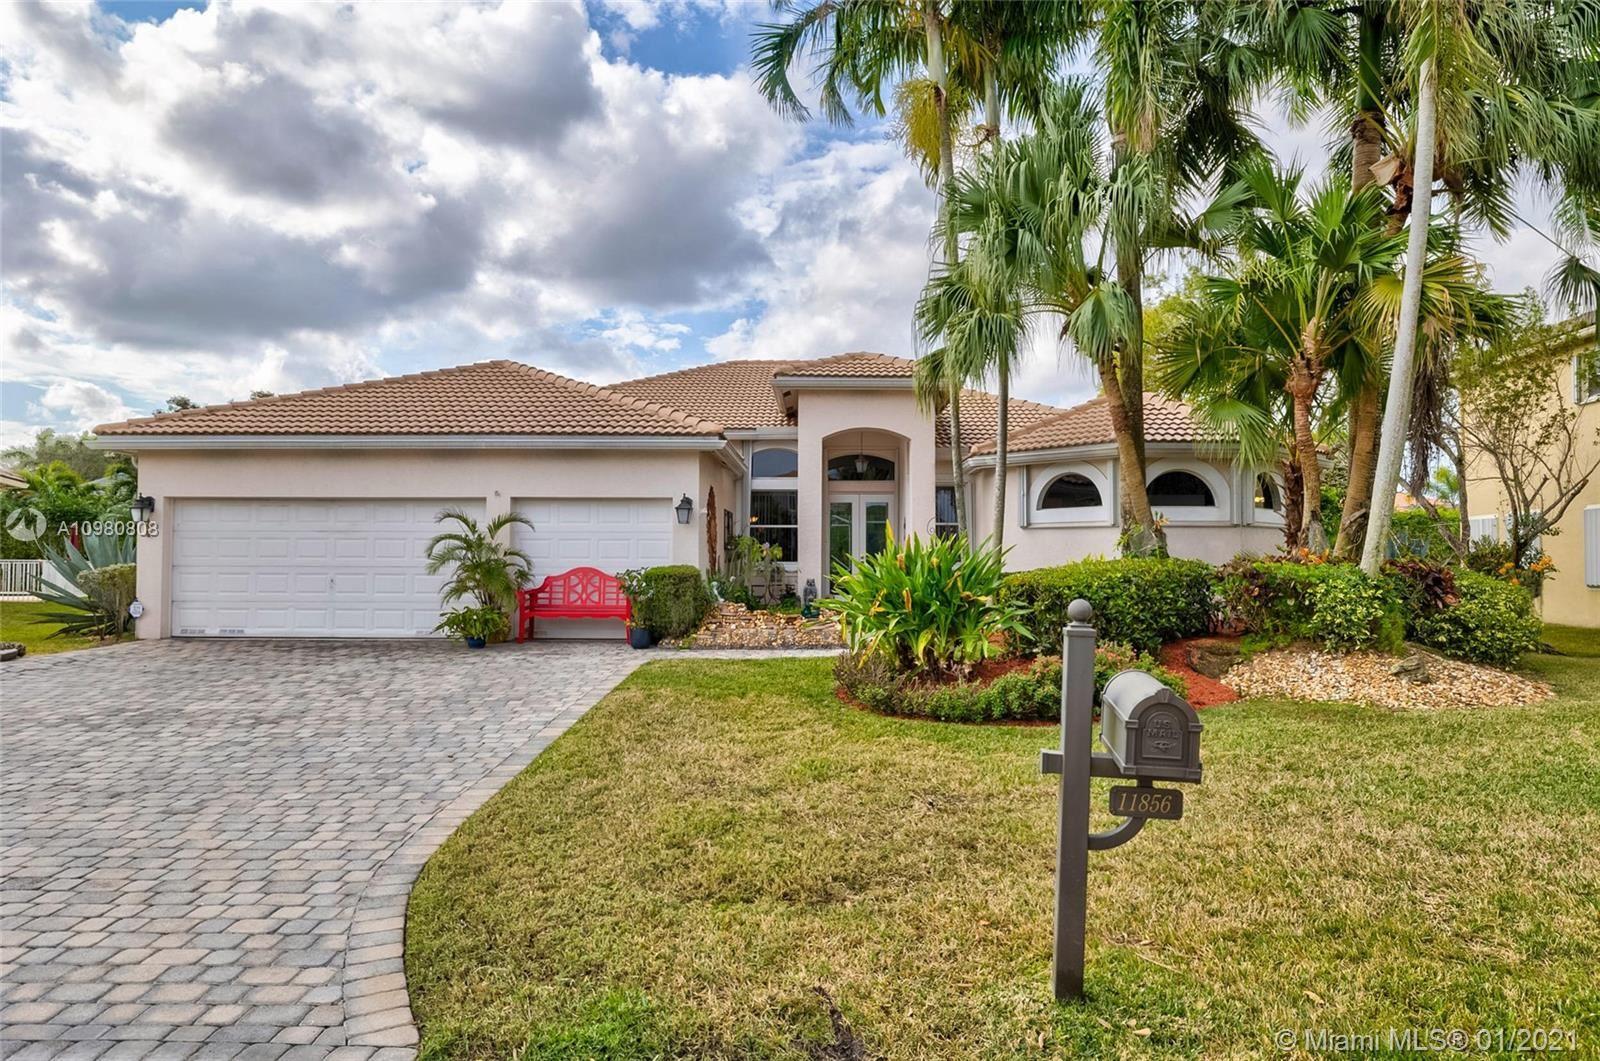 11856 NW 12th Mnr, Coral Springs, FL 33071 - #: A10980808